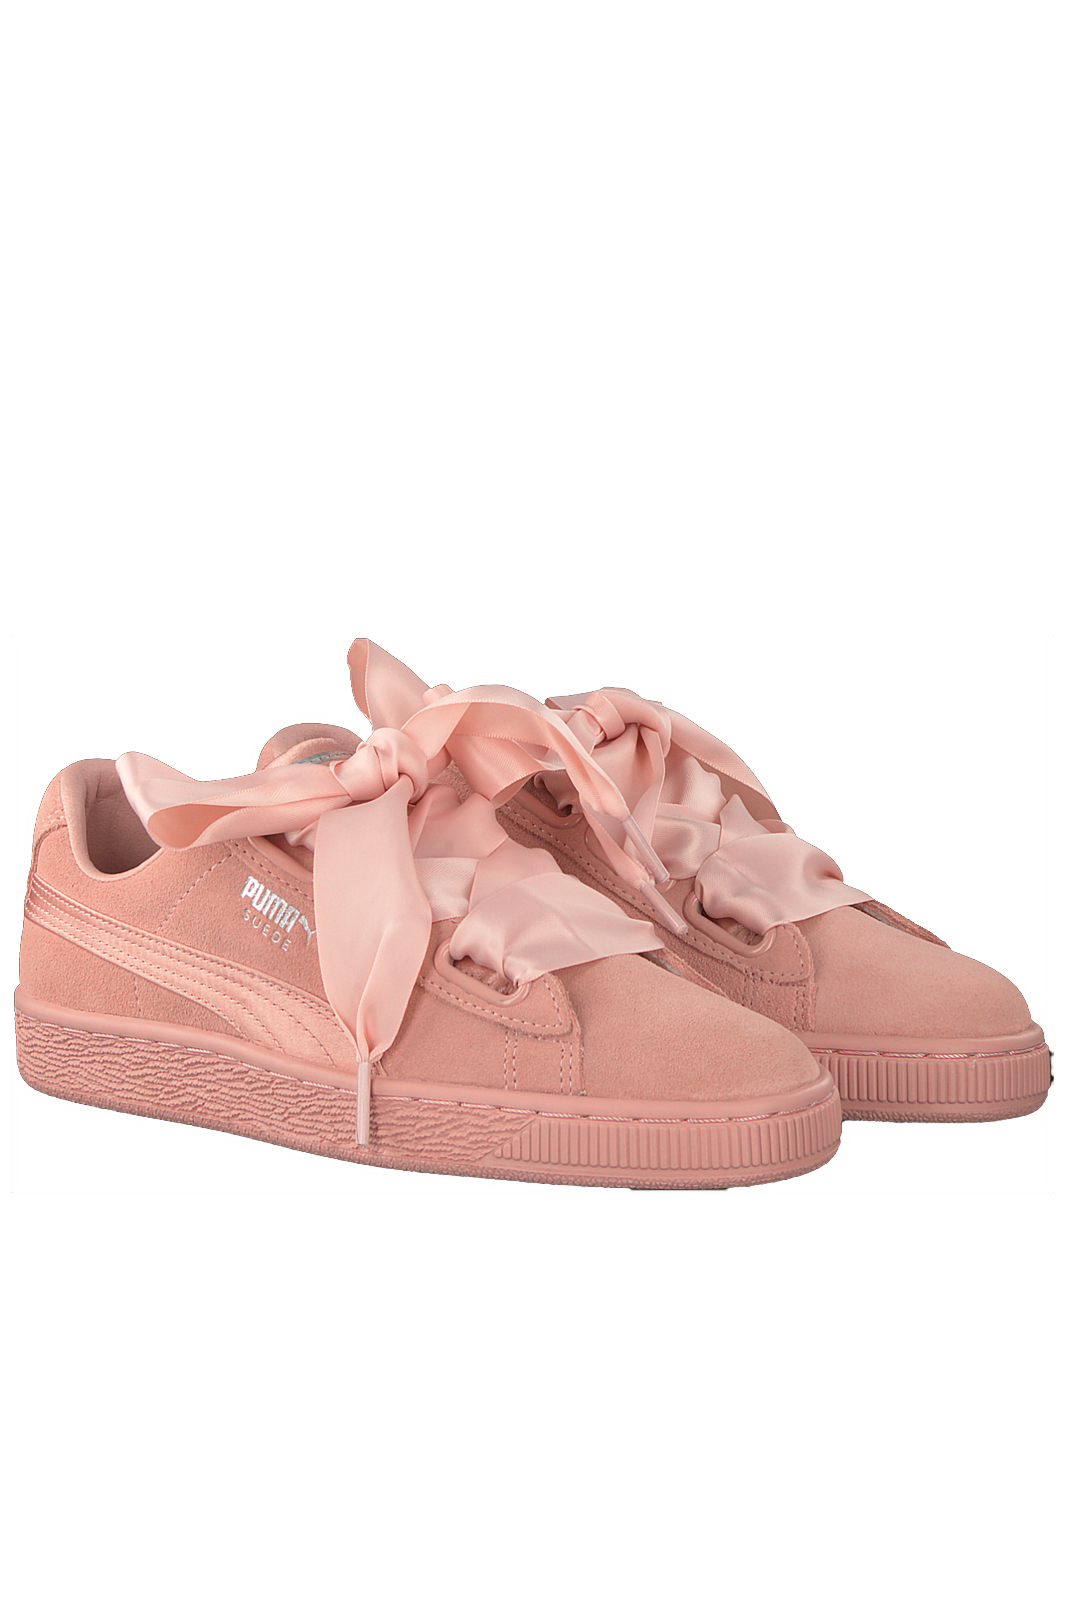 Baskets / Sneakers  Puma 366922 02 ROSE